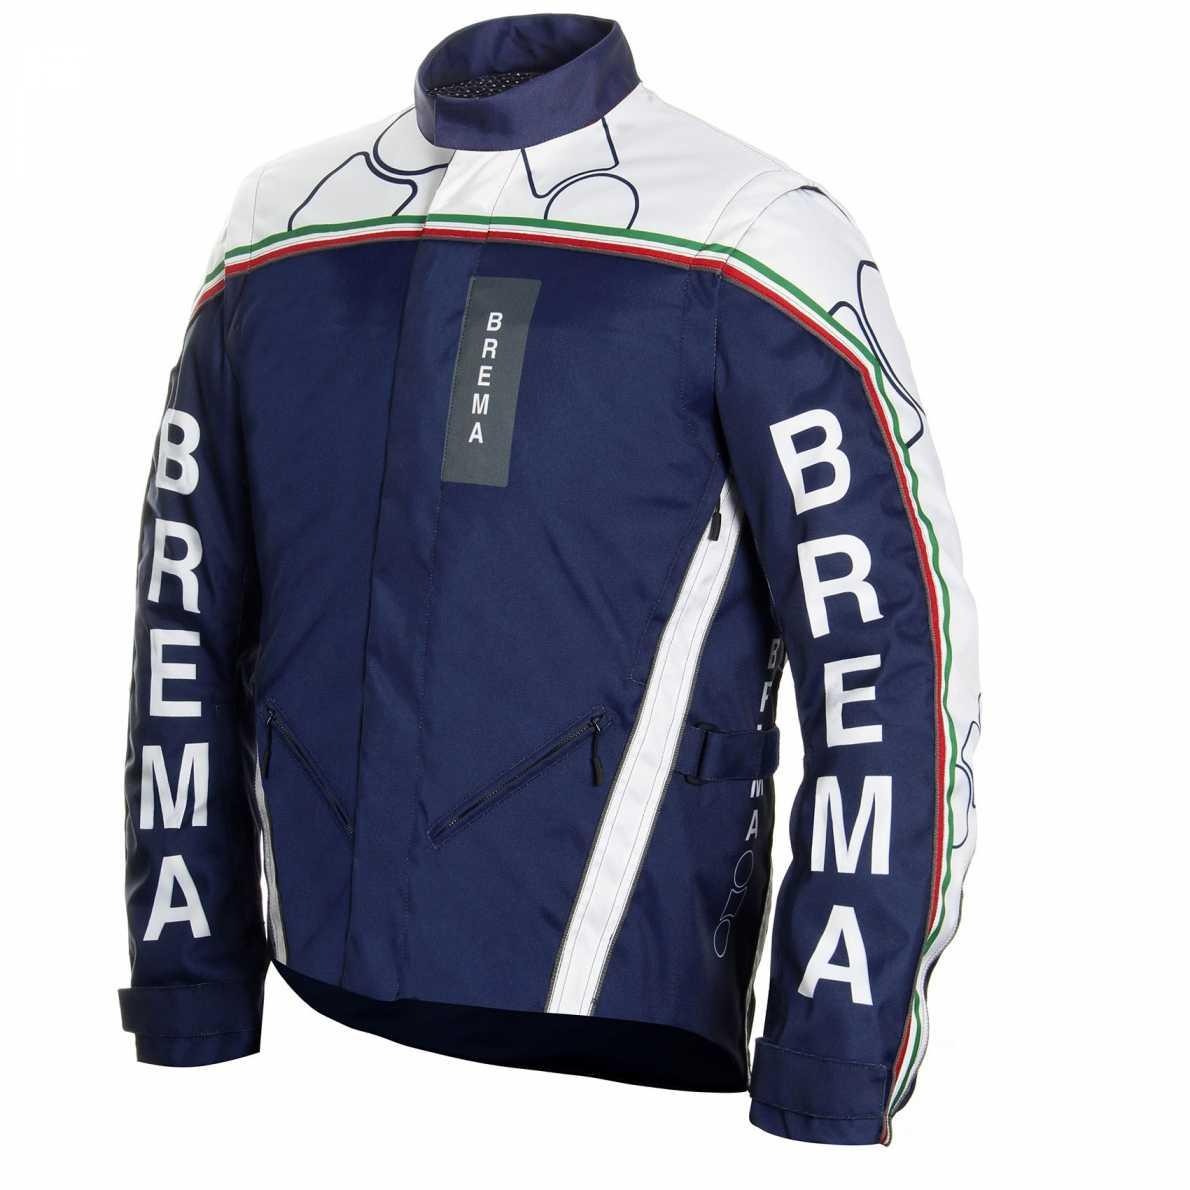 Veste Enduro BREMA Troféo. Crédits : ©accessoires-moto-enduro-cross.fr 2016